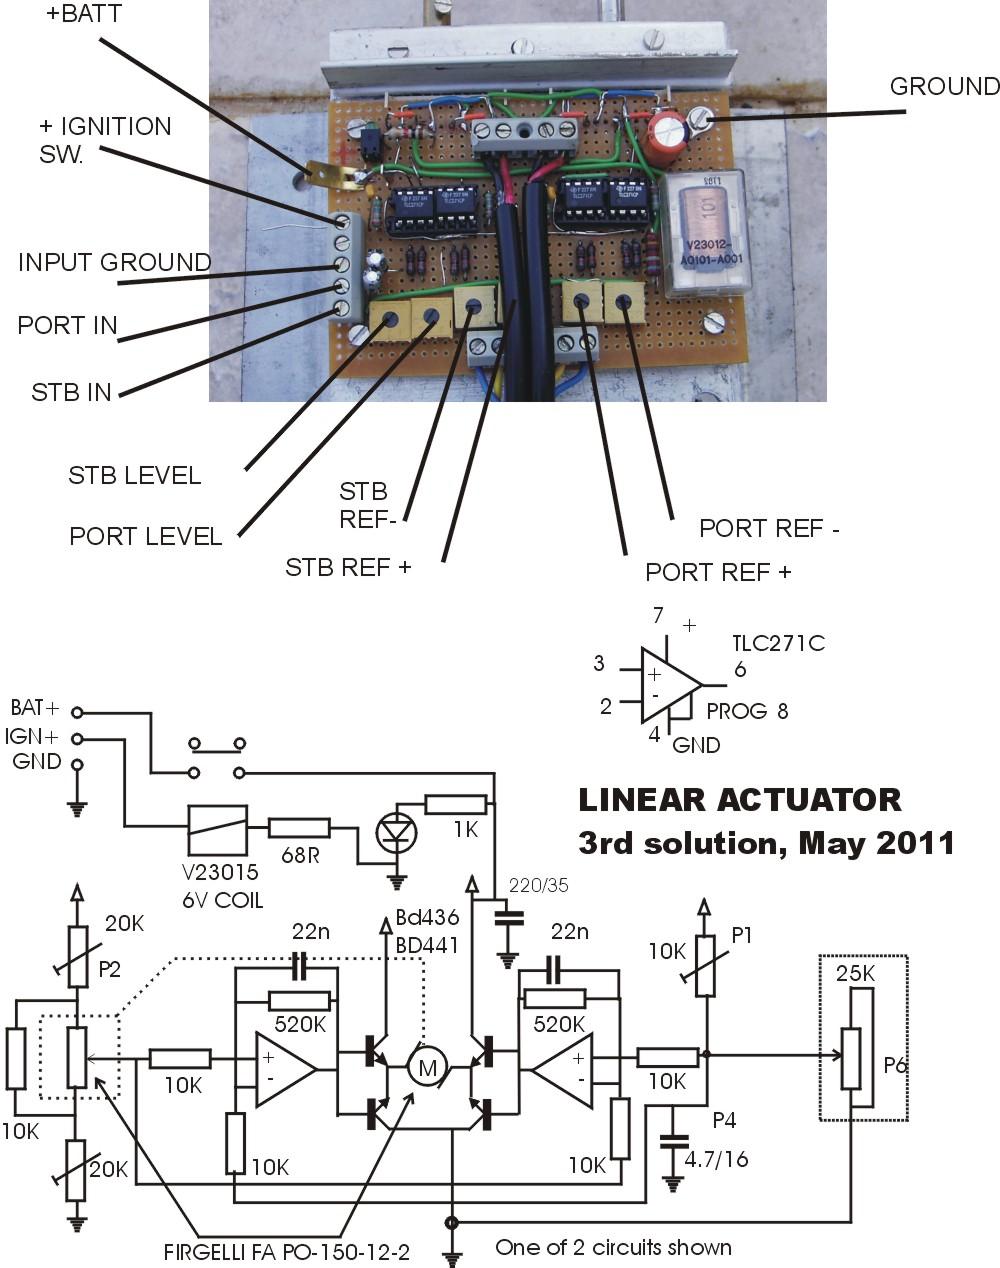 Boat Throttle Wiring Diagram : Marine wiring diagrams sailboat mast circuit diagram maker